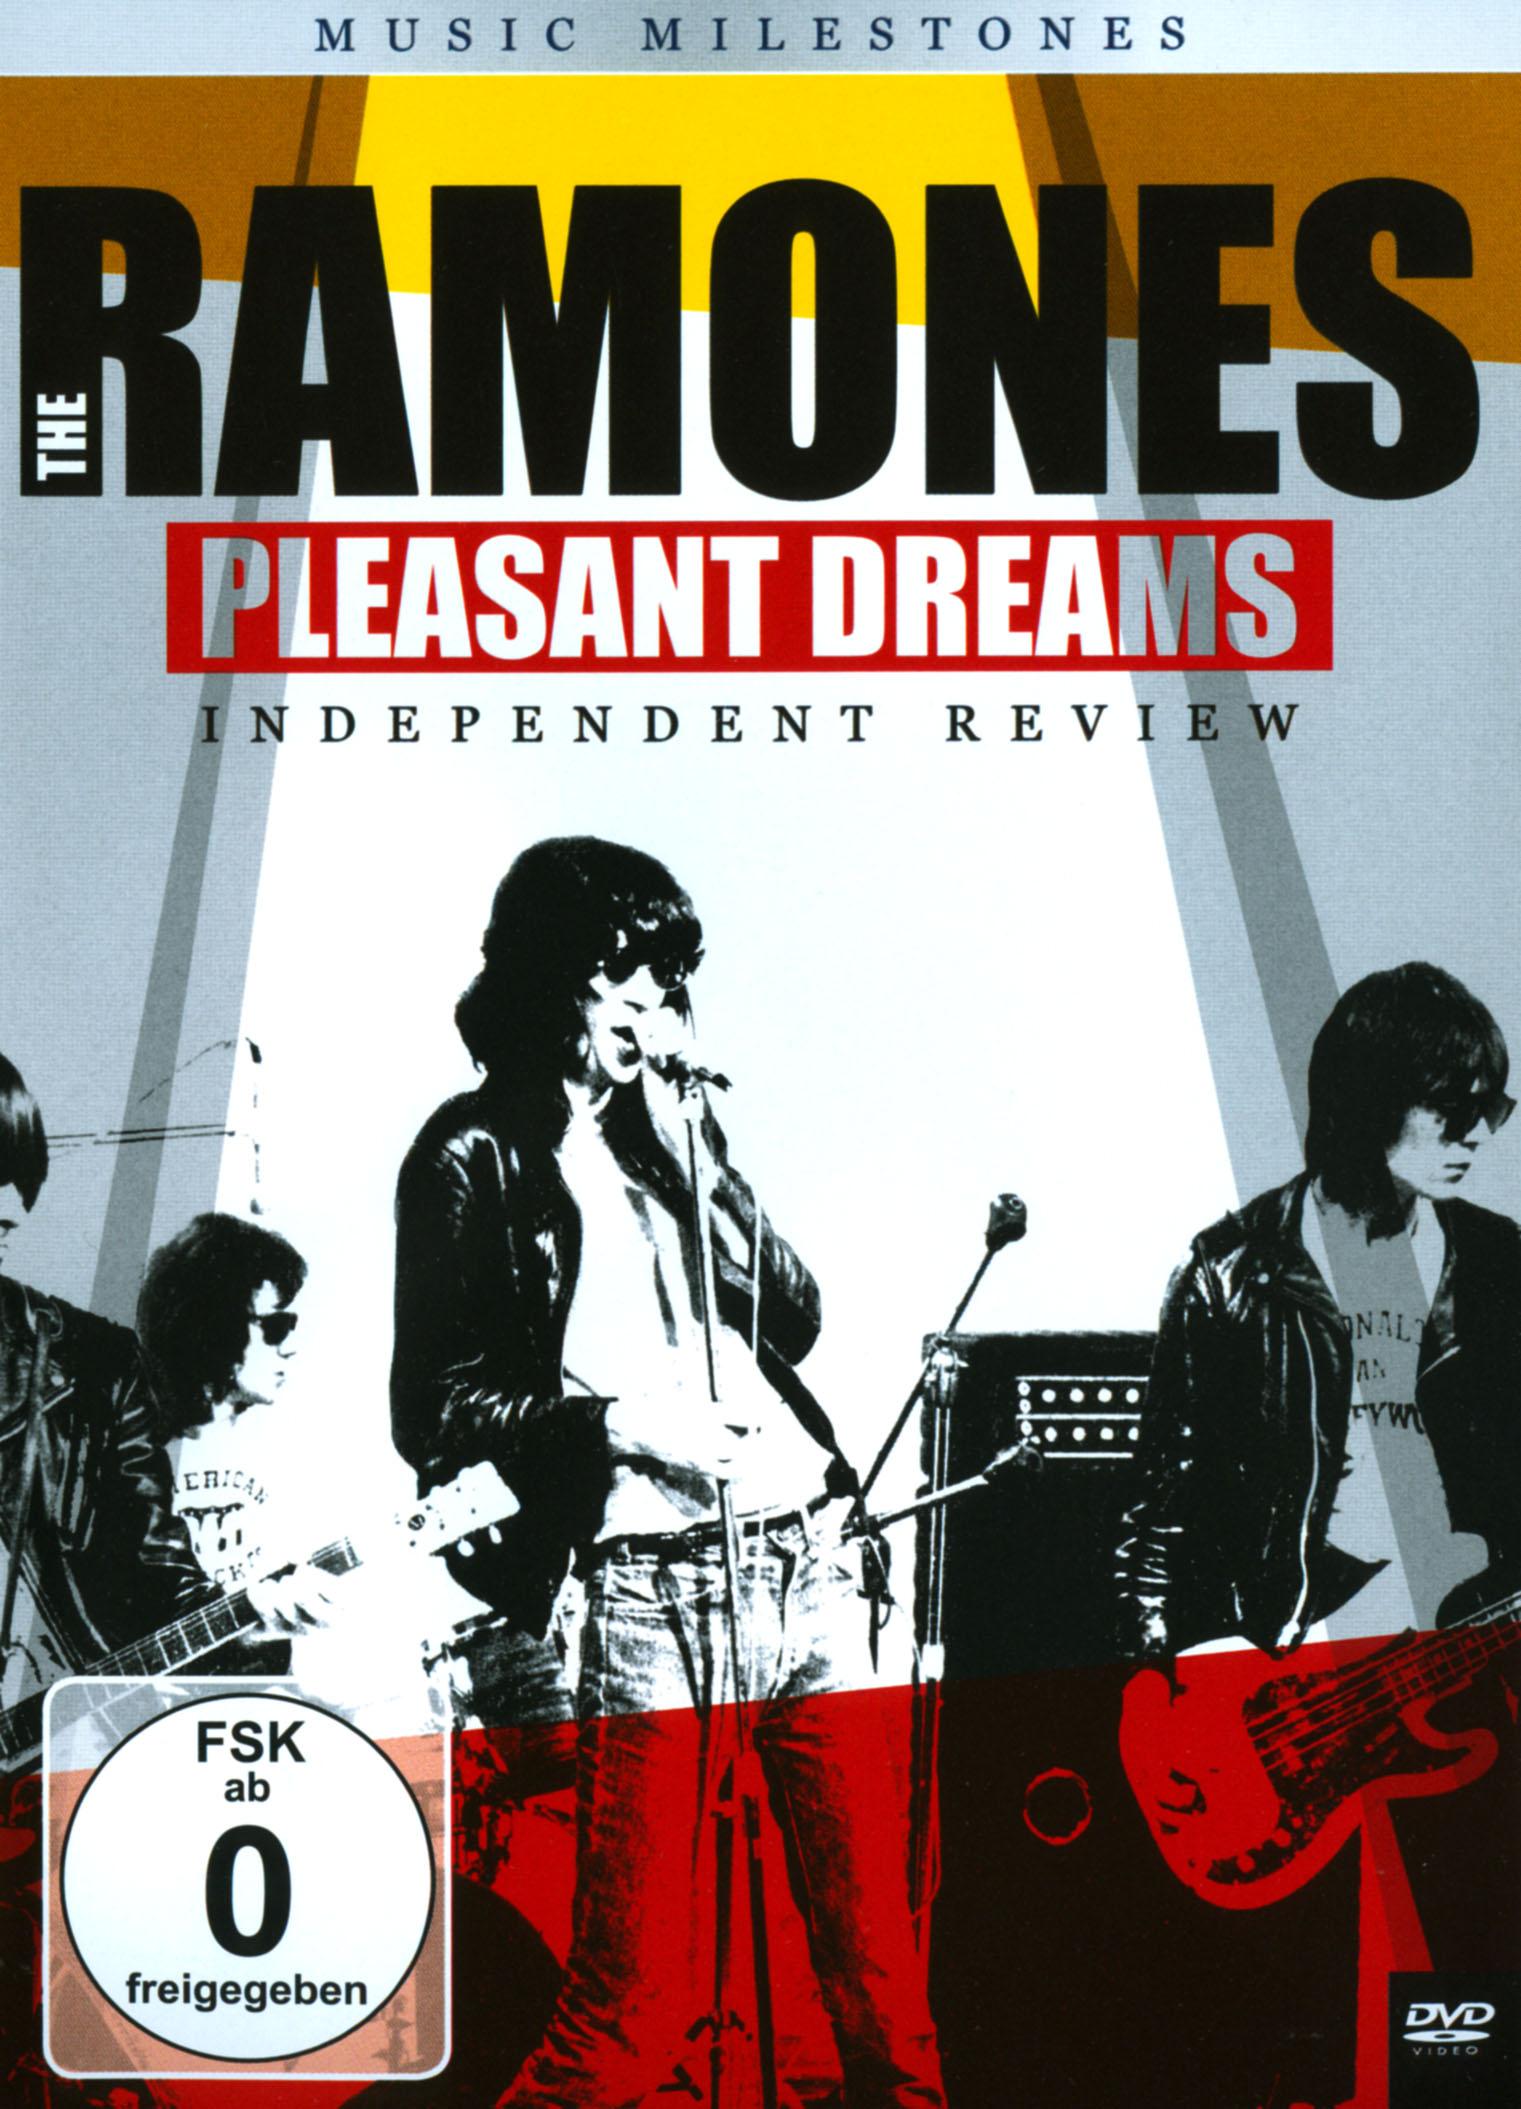 The Ramones: Music Milestones - Pleasant Dreams